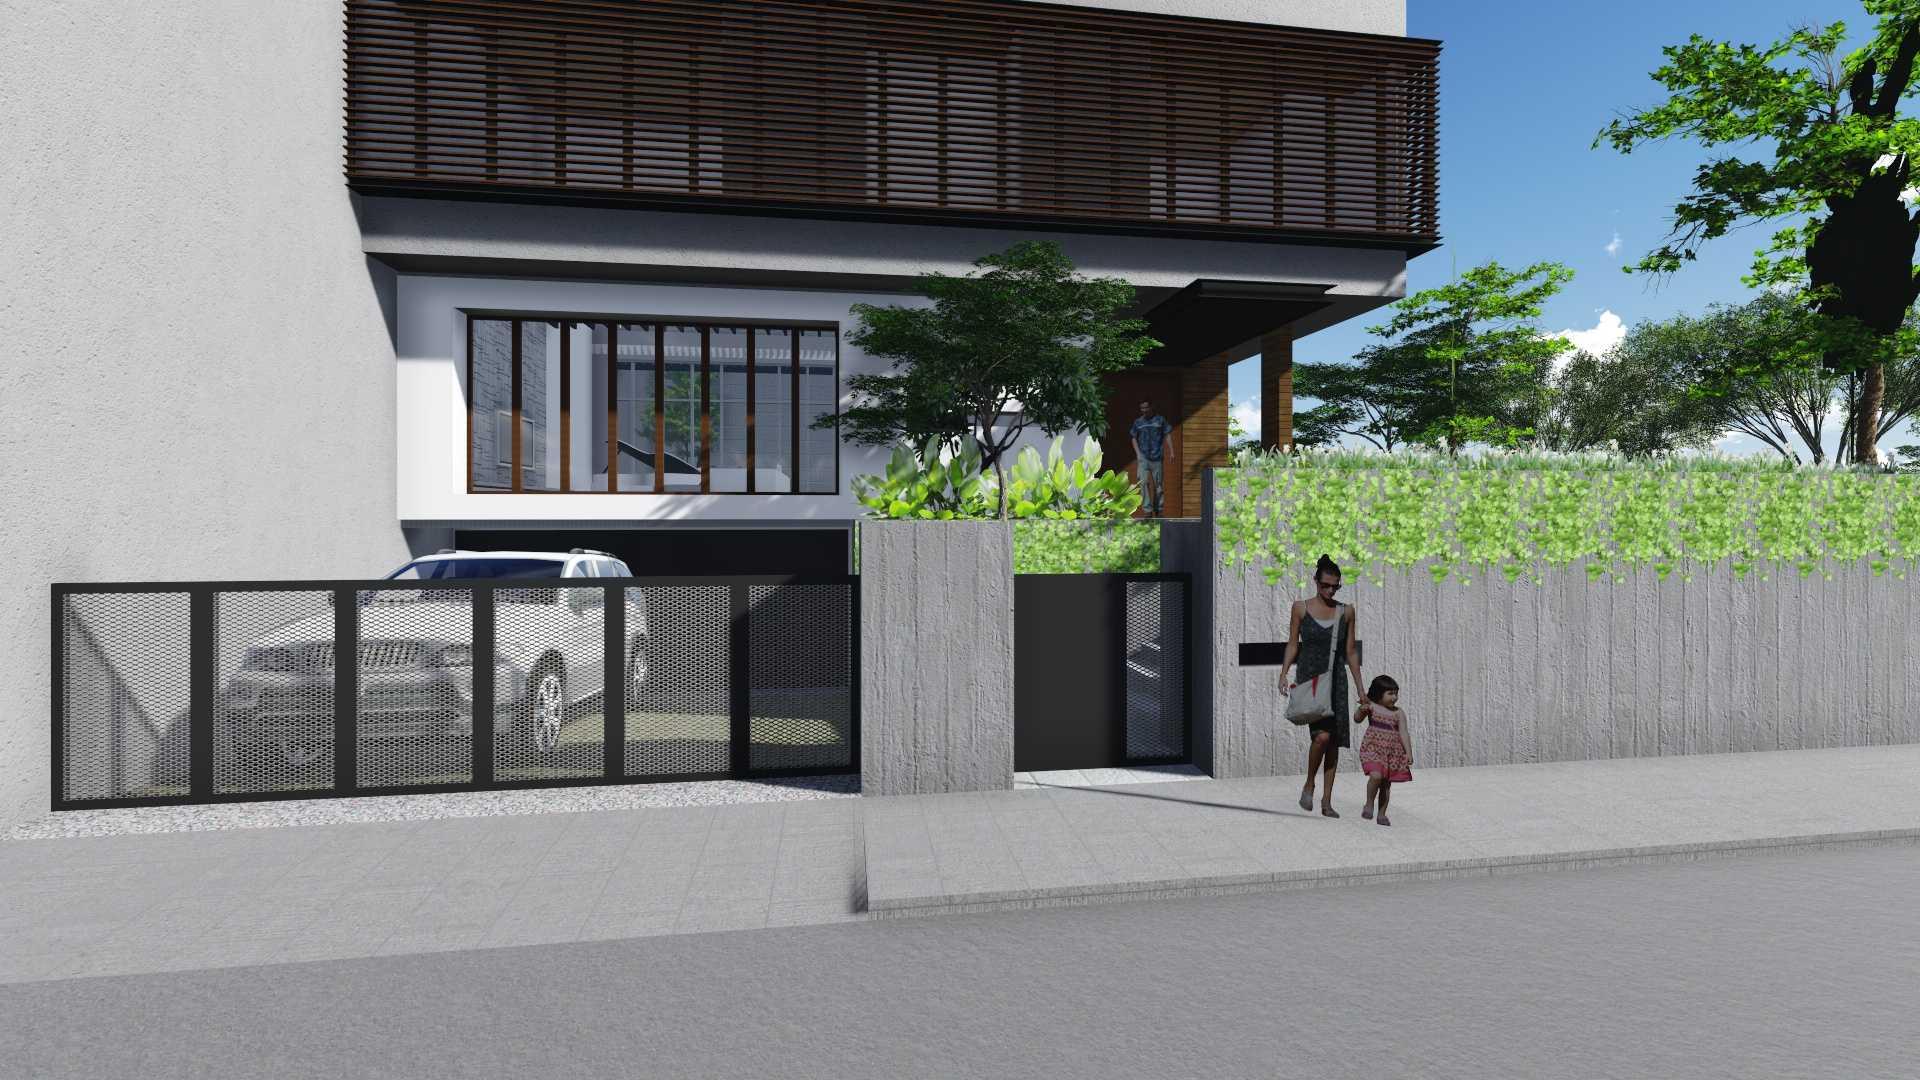 Lima Dua Studio Gk House Jakarta Utara, Kota Jkt Utara, Daerah Khusus Ibukota Jakarta, Indonesia Jakarta Utara, Kota Jkt Utara, Daerah Khusus Ibukota Jakarta, Indonesia Gk-House   69569